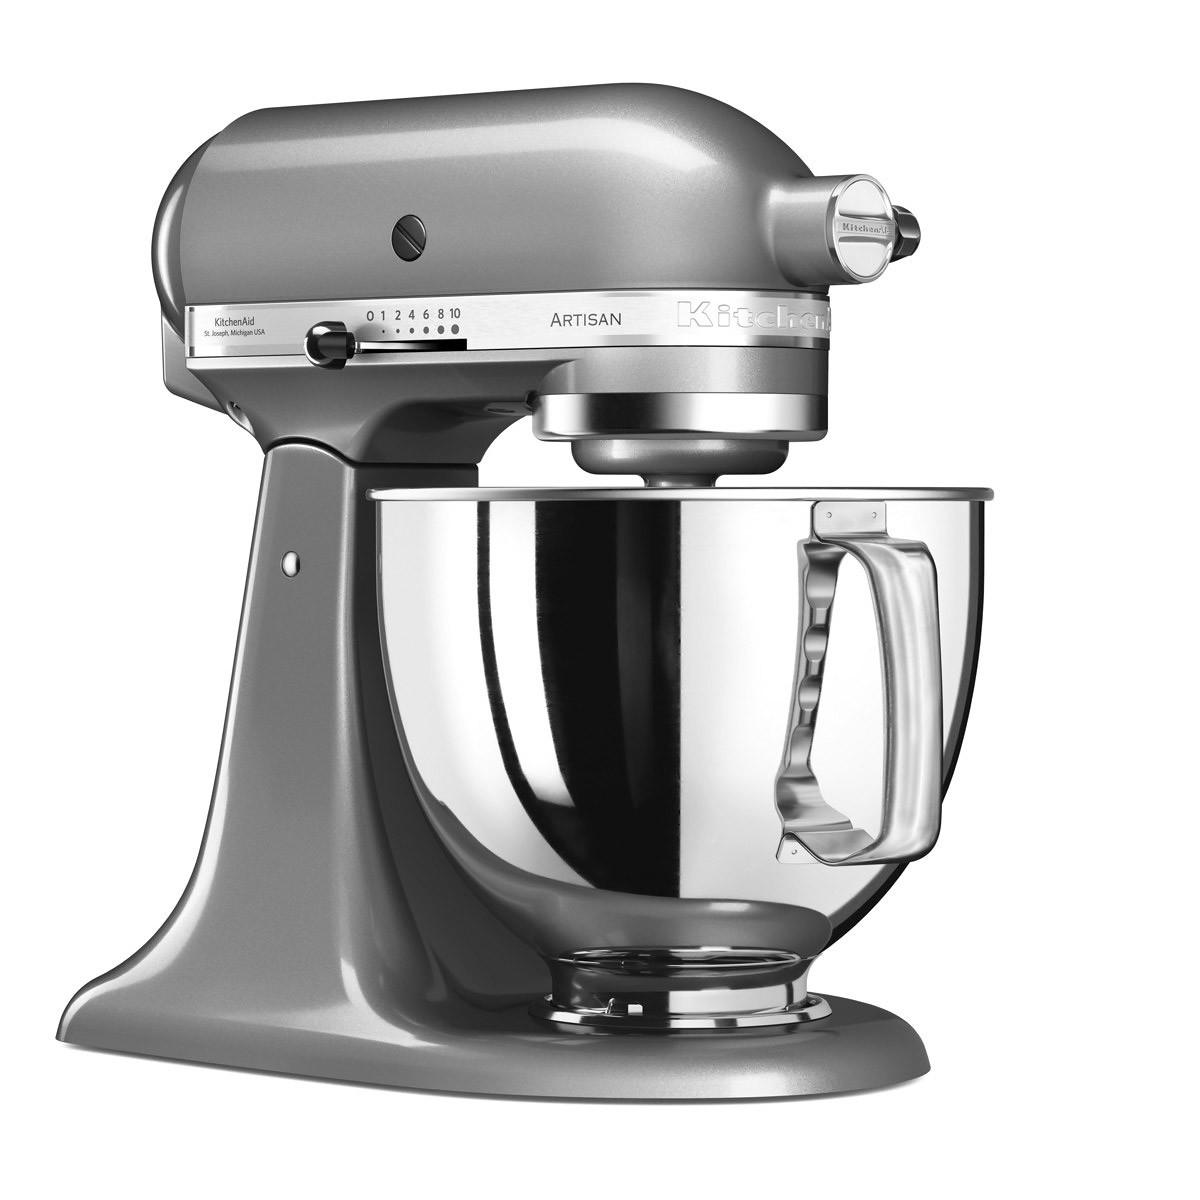 KitchenAid Artisan Original standmixer 4,8 liter Contour Silver